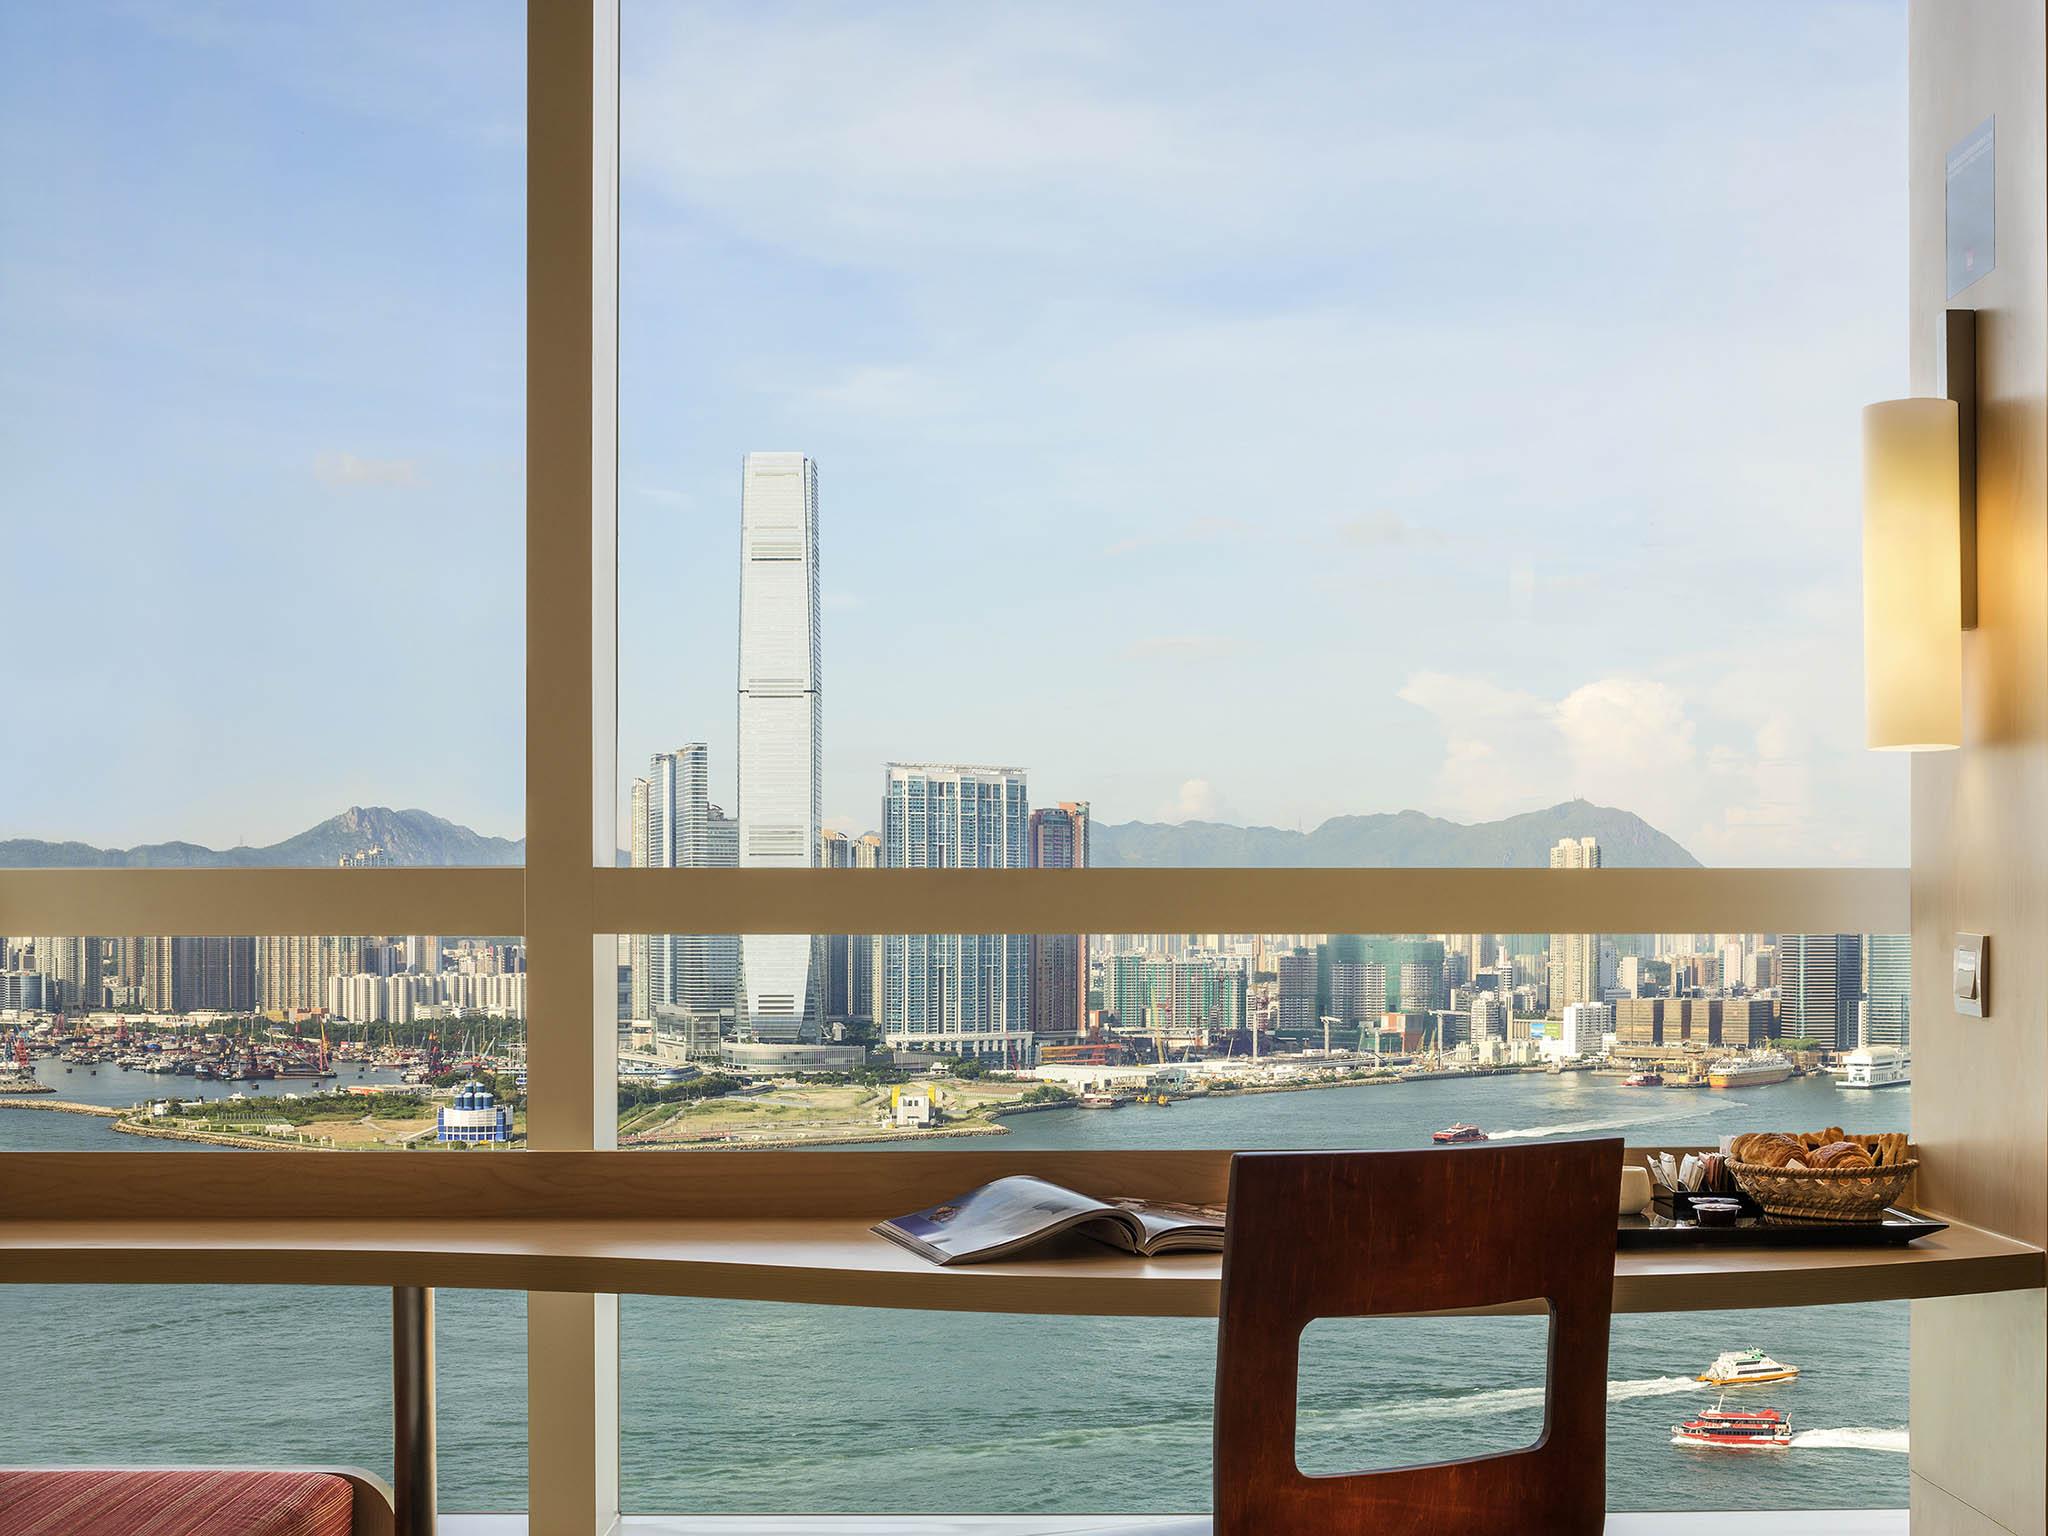 فندق - إيبيس ibis هونغ كونغ سنترال وشوانغ وان